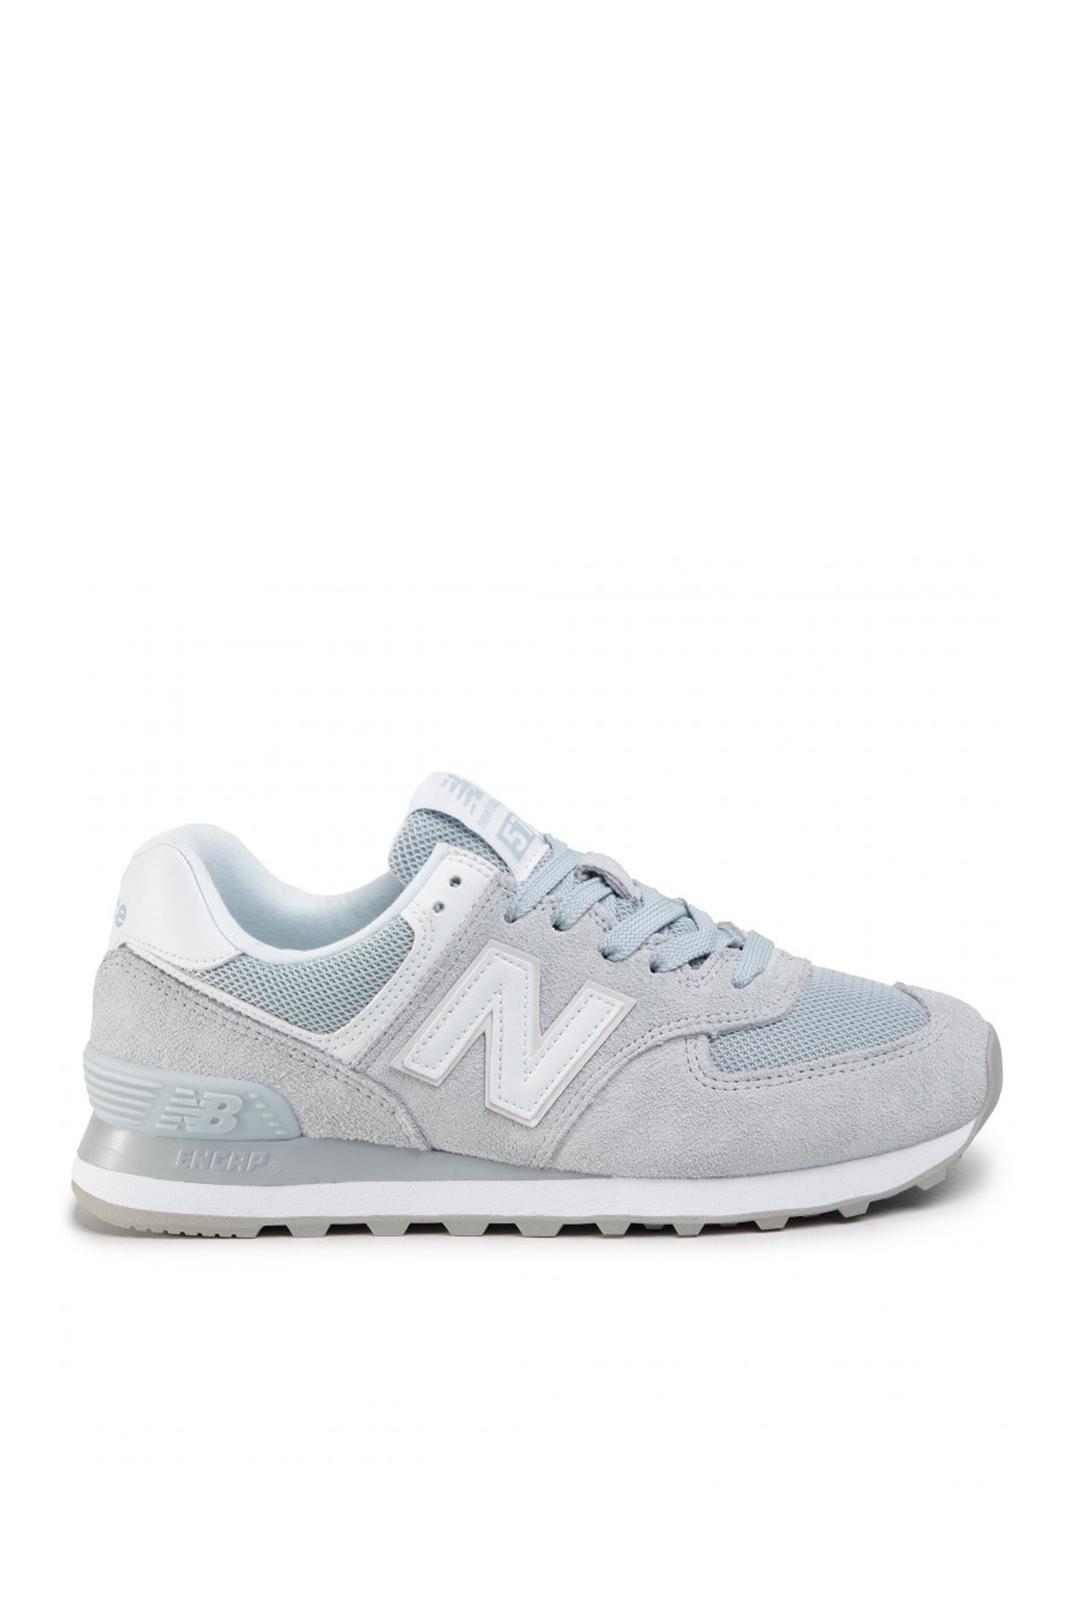 Chaussures  New balance WL574OAA oaa